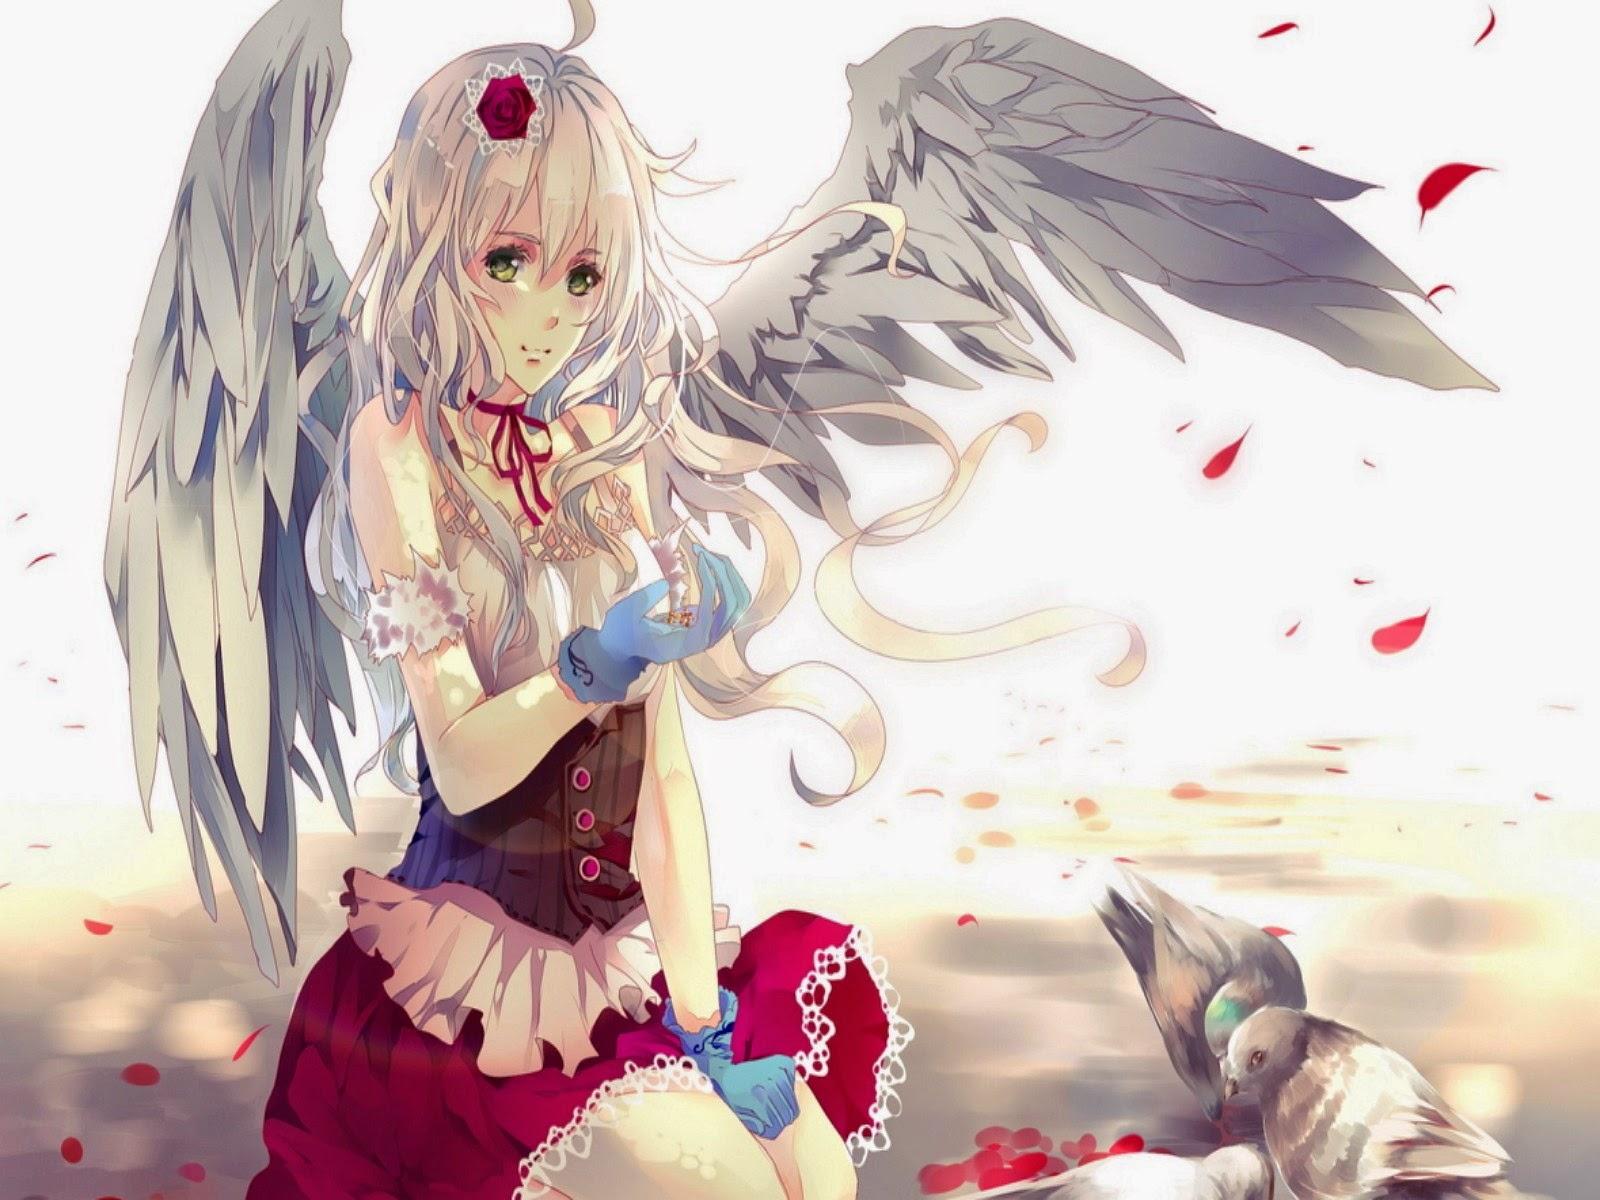 Wallpaper Gadis Anime Bersayap